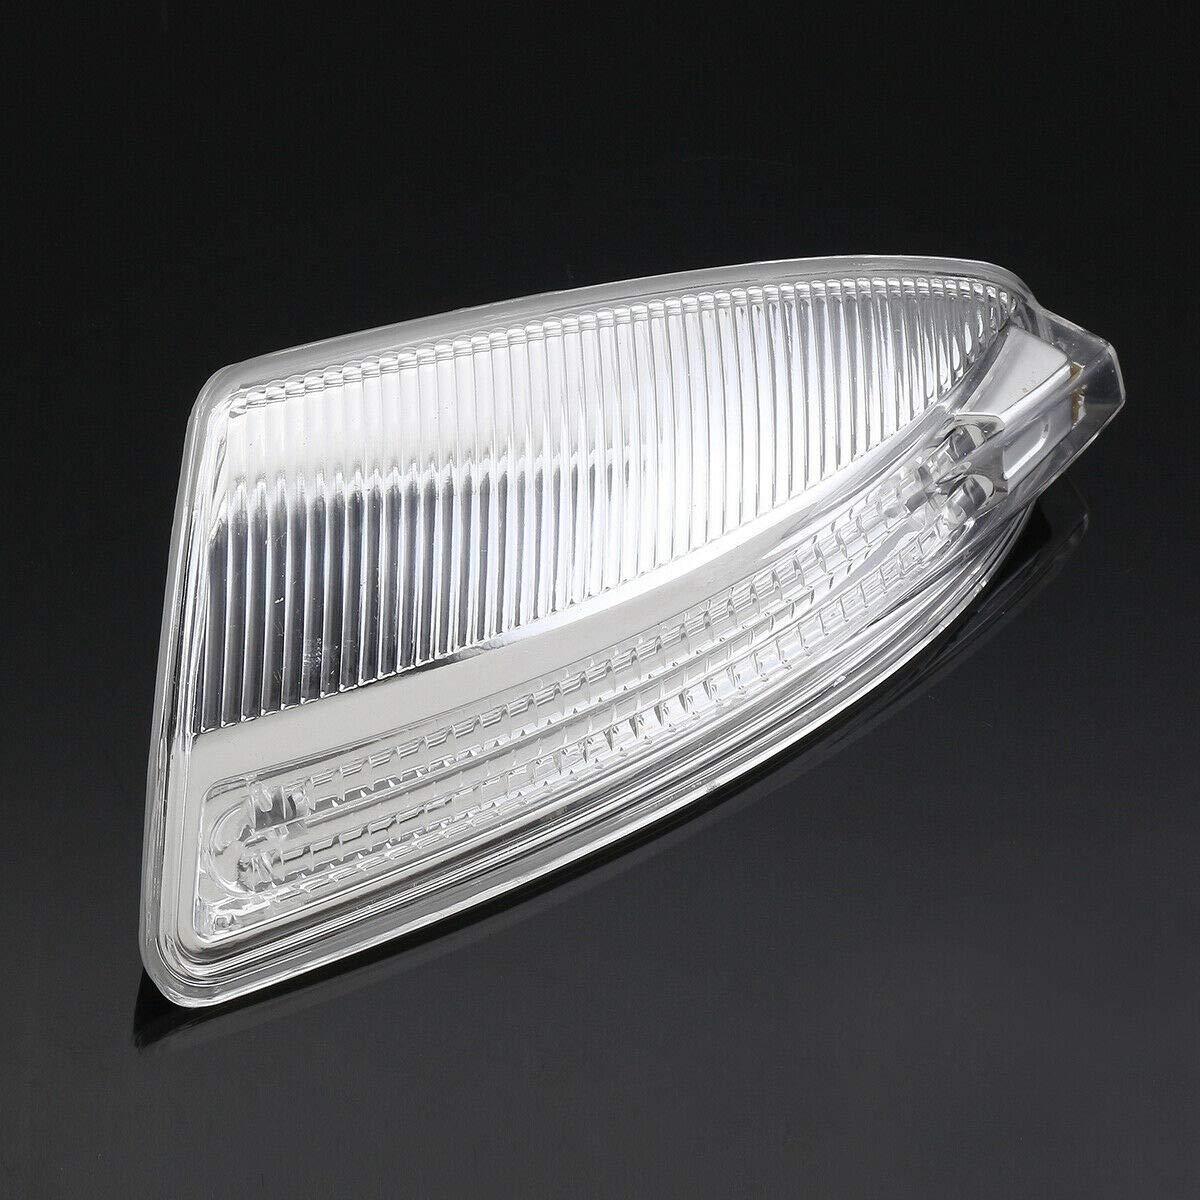 Basage L/áMparas de Luces Intermitentes de Espejo Lateral Izquierdo para Mercedes Ml Class C-Class W204